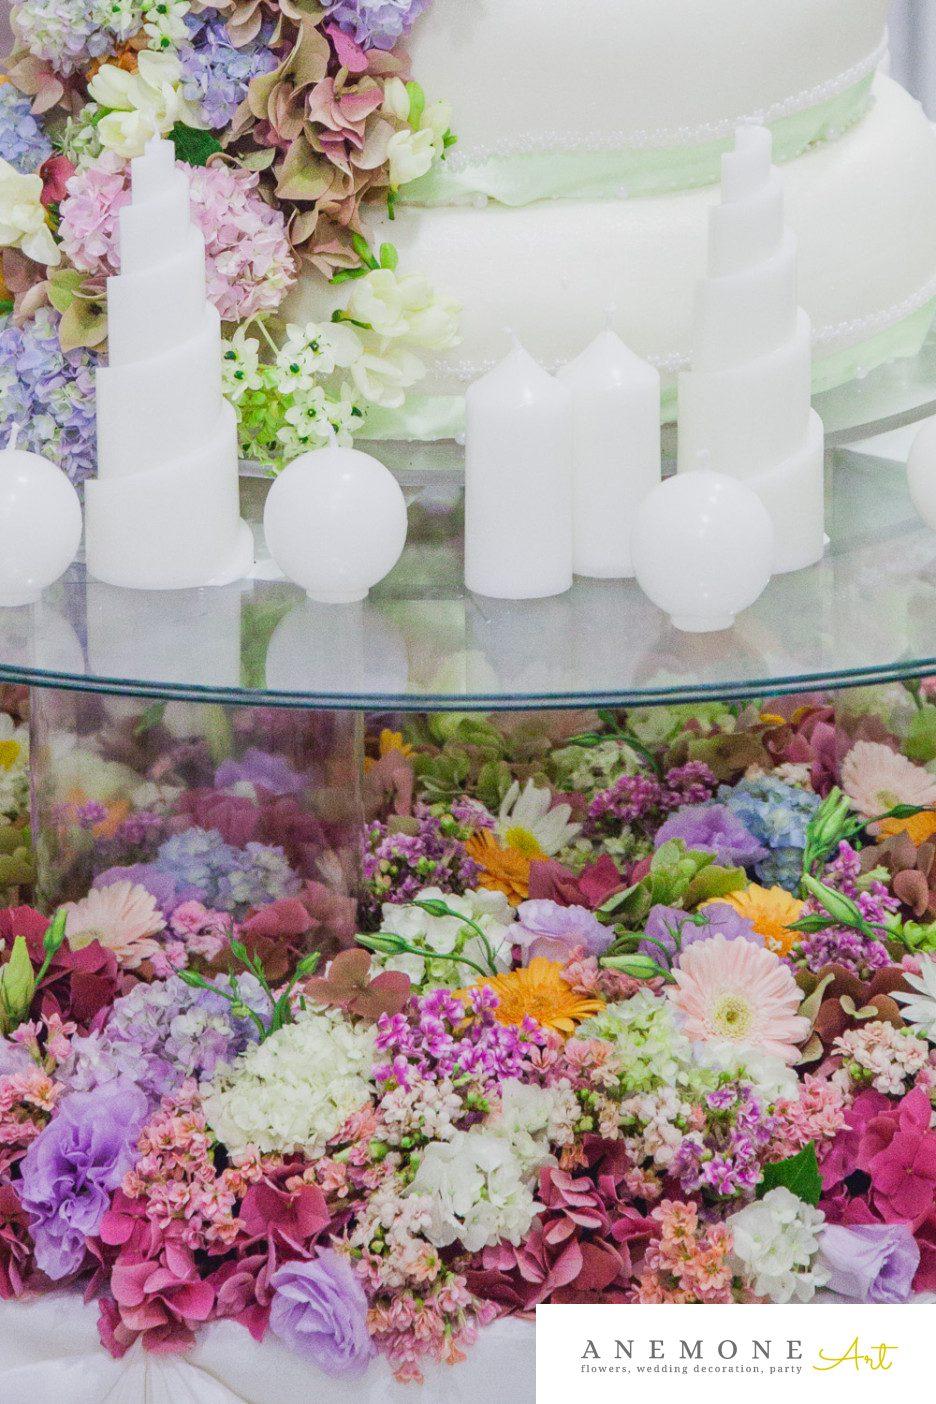 Poza, foto cu Flori de nunta decor tort, masa tort, multicolor in Arad, Timisoara, Oradea (wedding flowers, bouquets) nunta Arad, Timisoara, Oradea